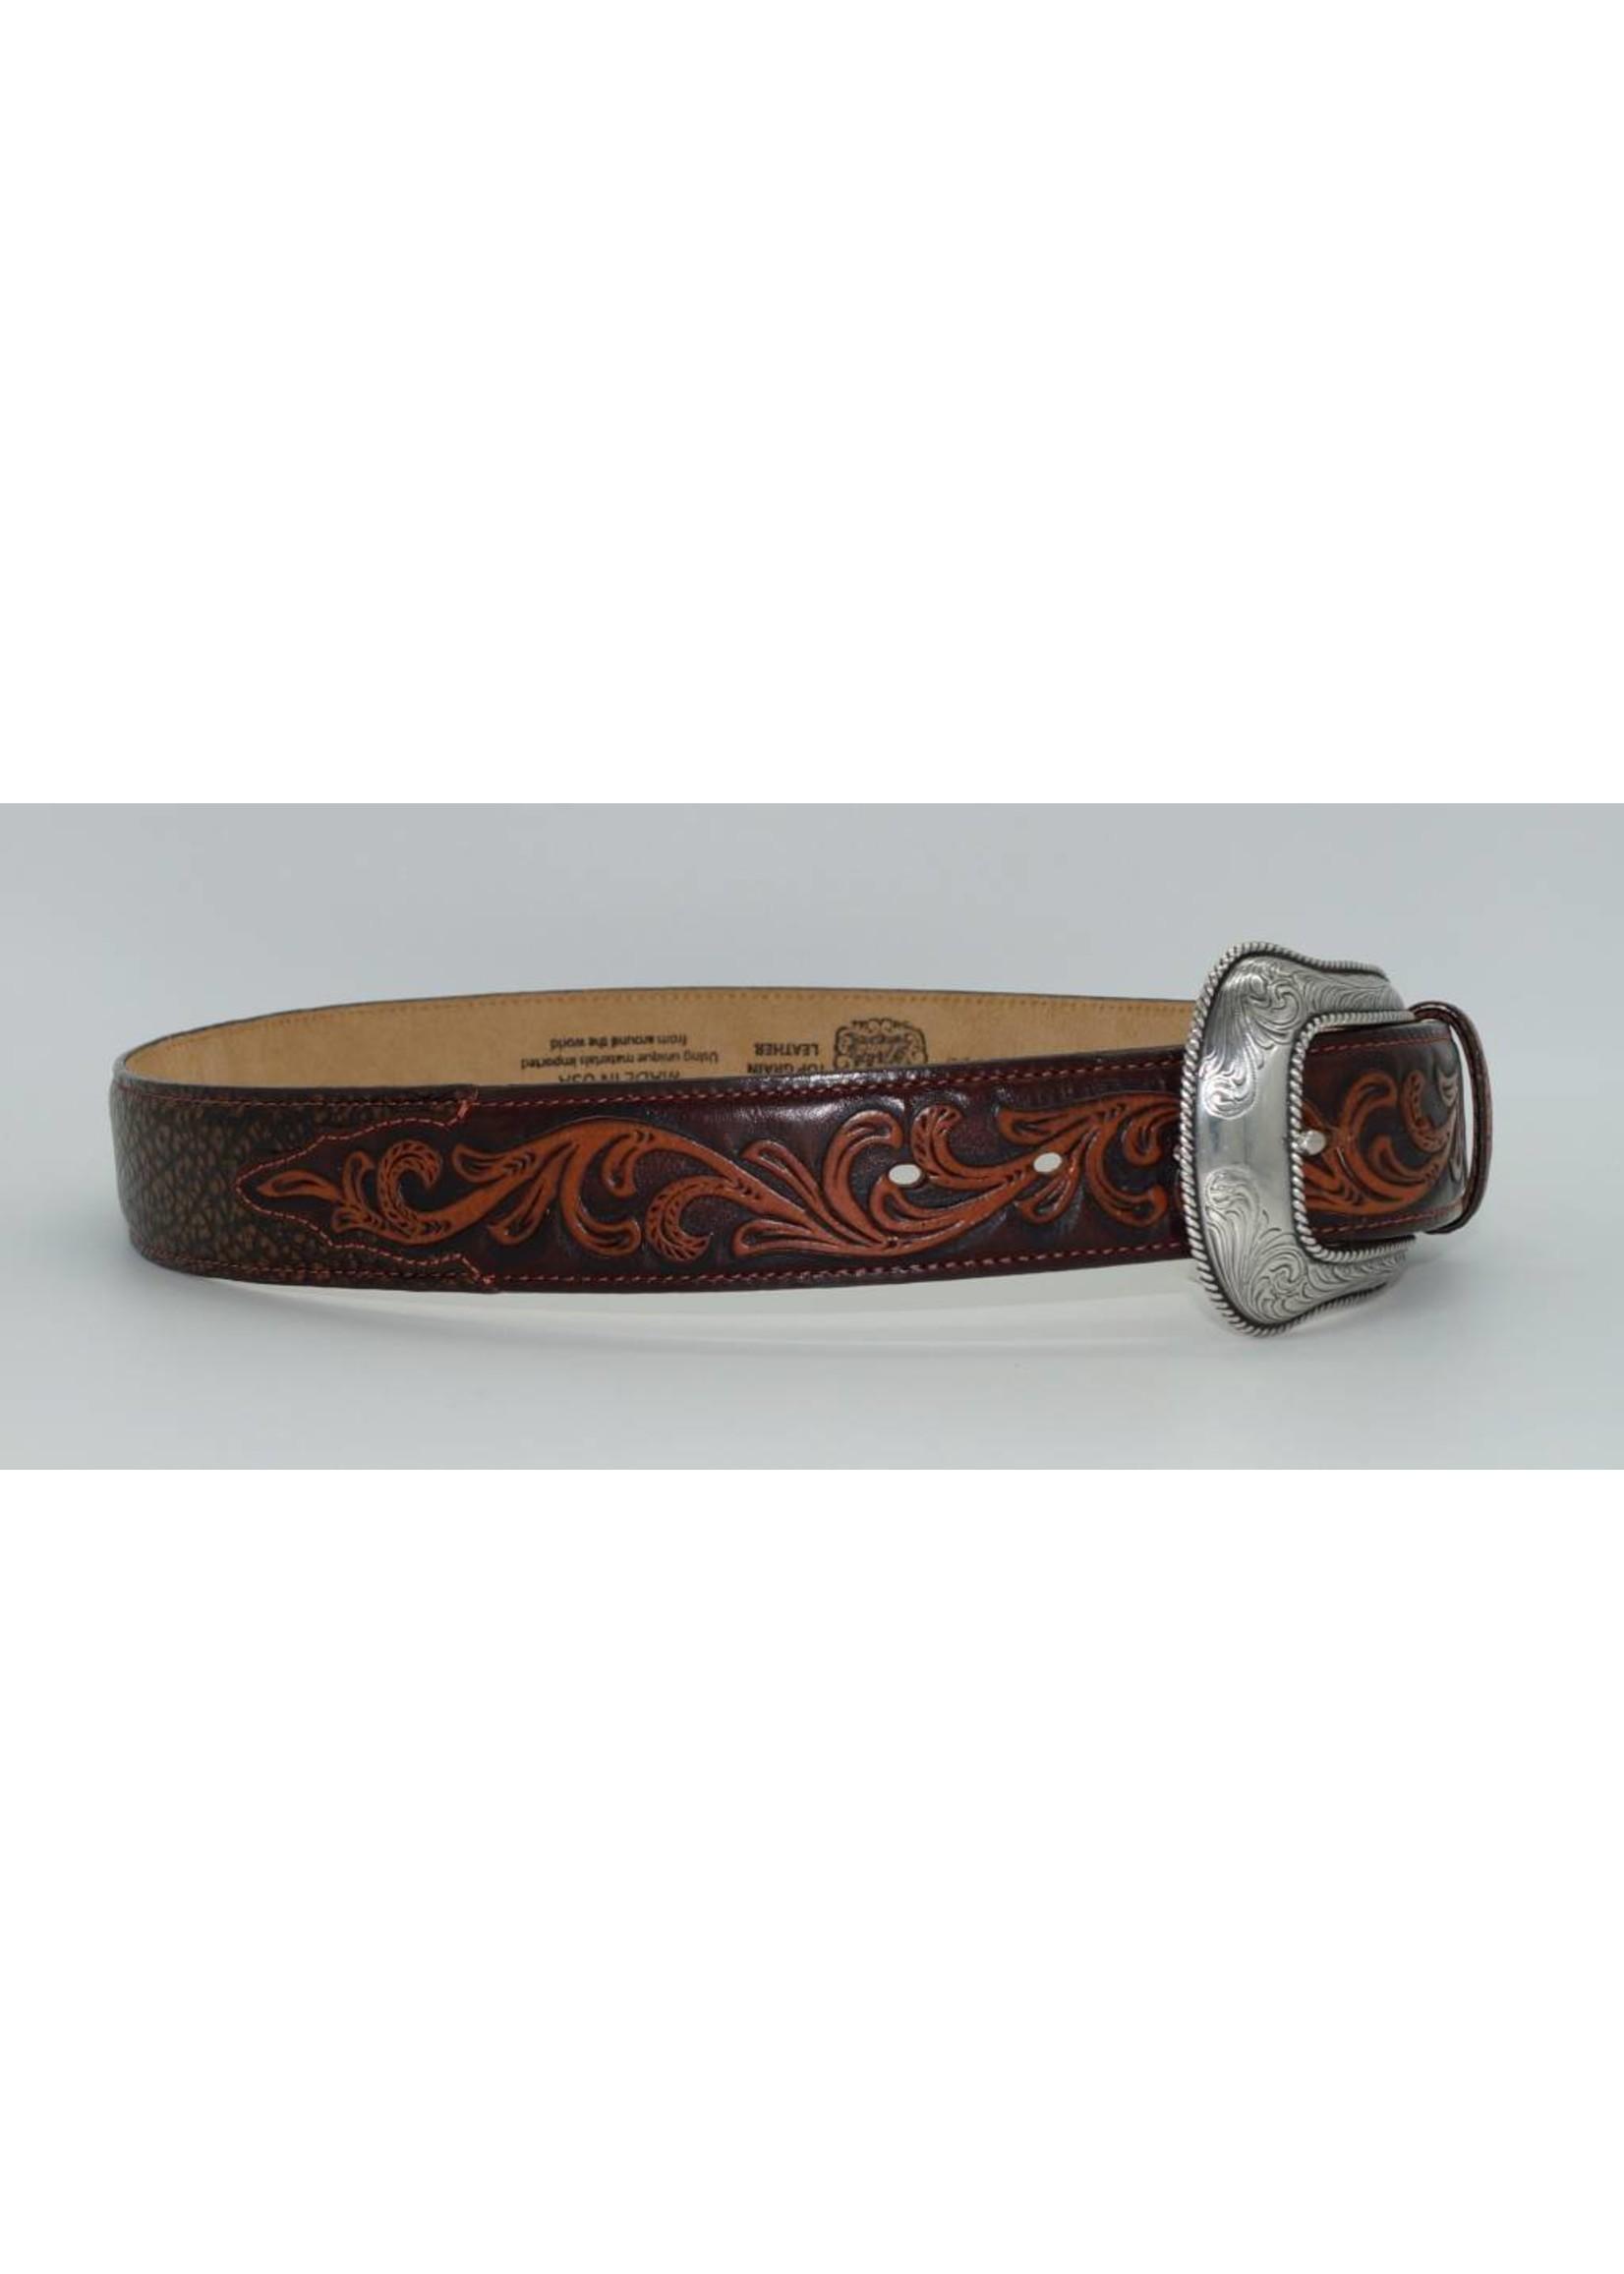 Tony Lama Men's Tooled Brown Leather Belt C42095